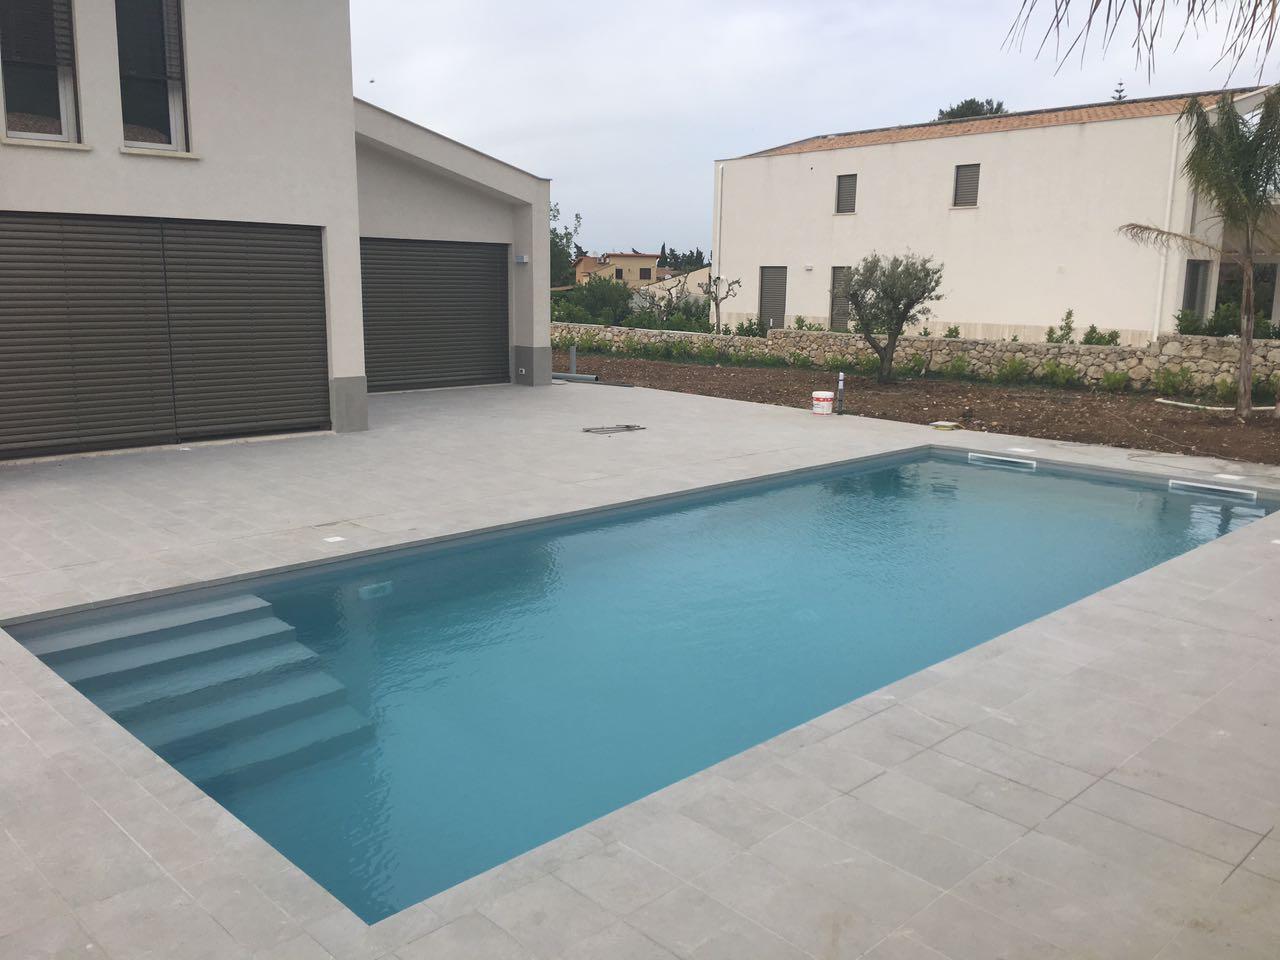 piscina 10x4 skimmer telo grigio scala interna piscine